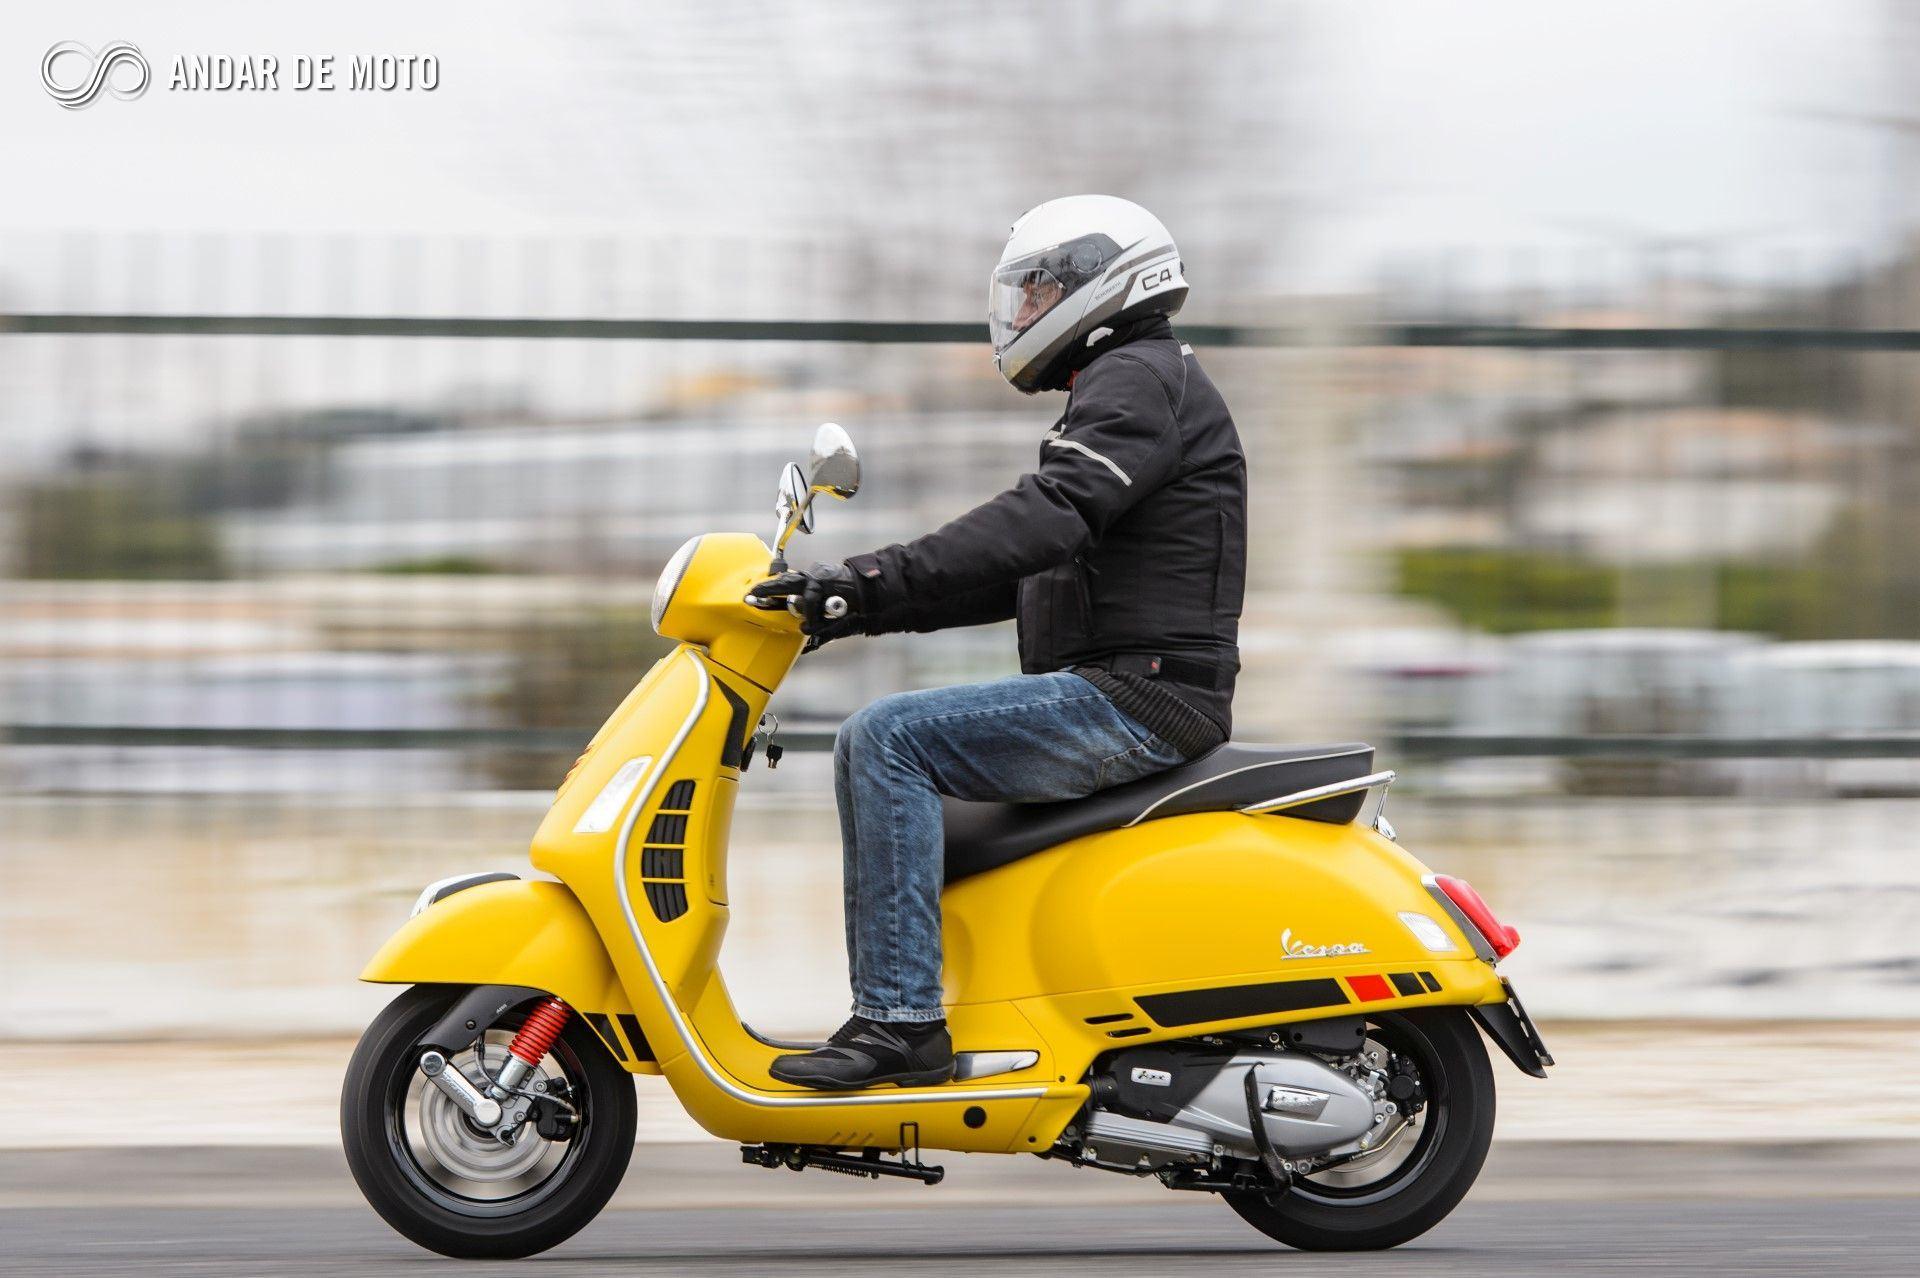 Scooters 125 Cc A Prova Das 9 Parte 9 Vespa Gts 125 Super Sport Piaggio Noticias Andar De Moto